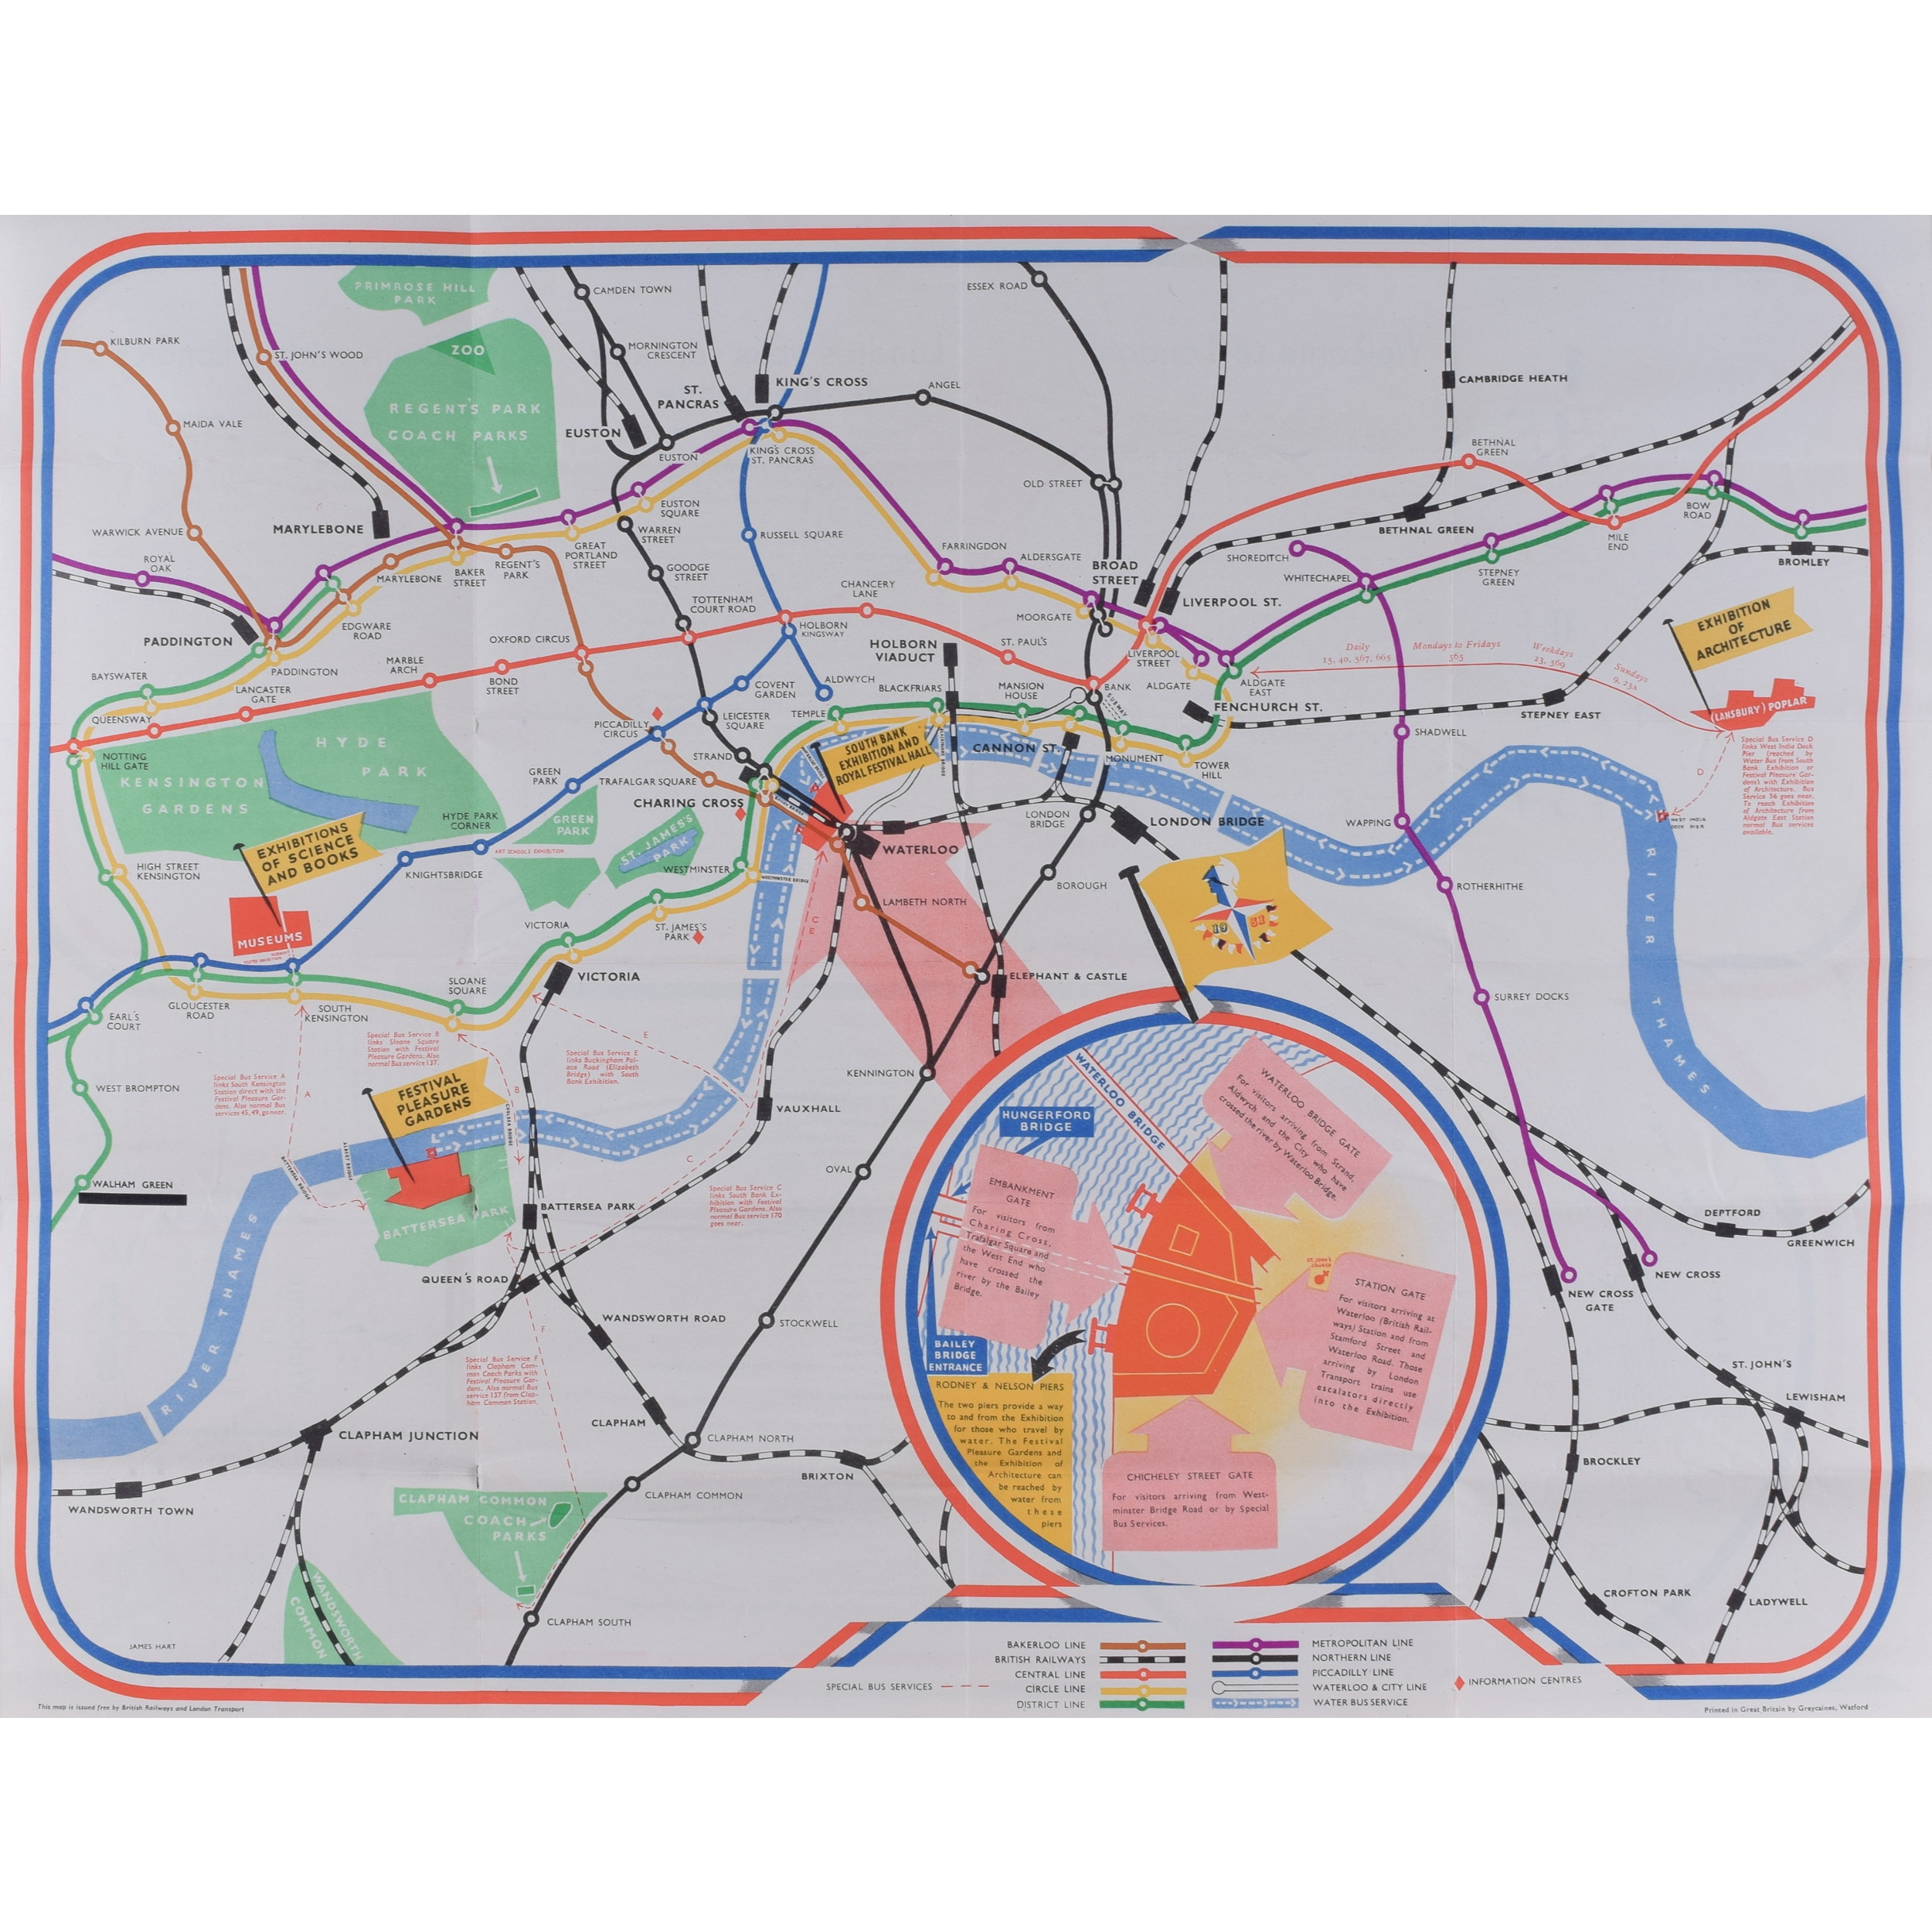 Festival of Britain map 1951